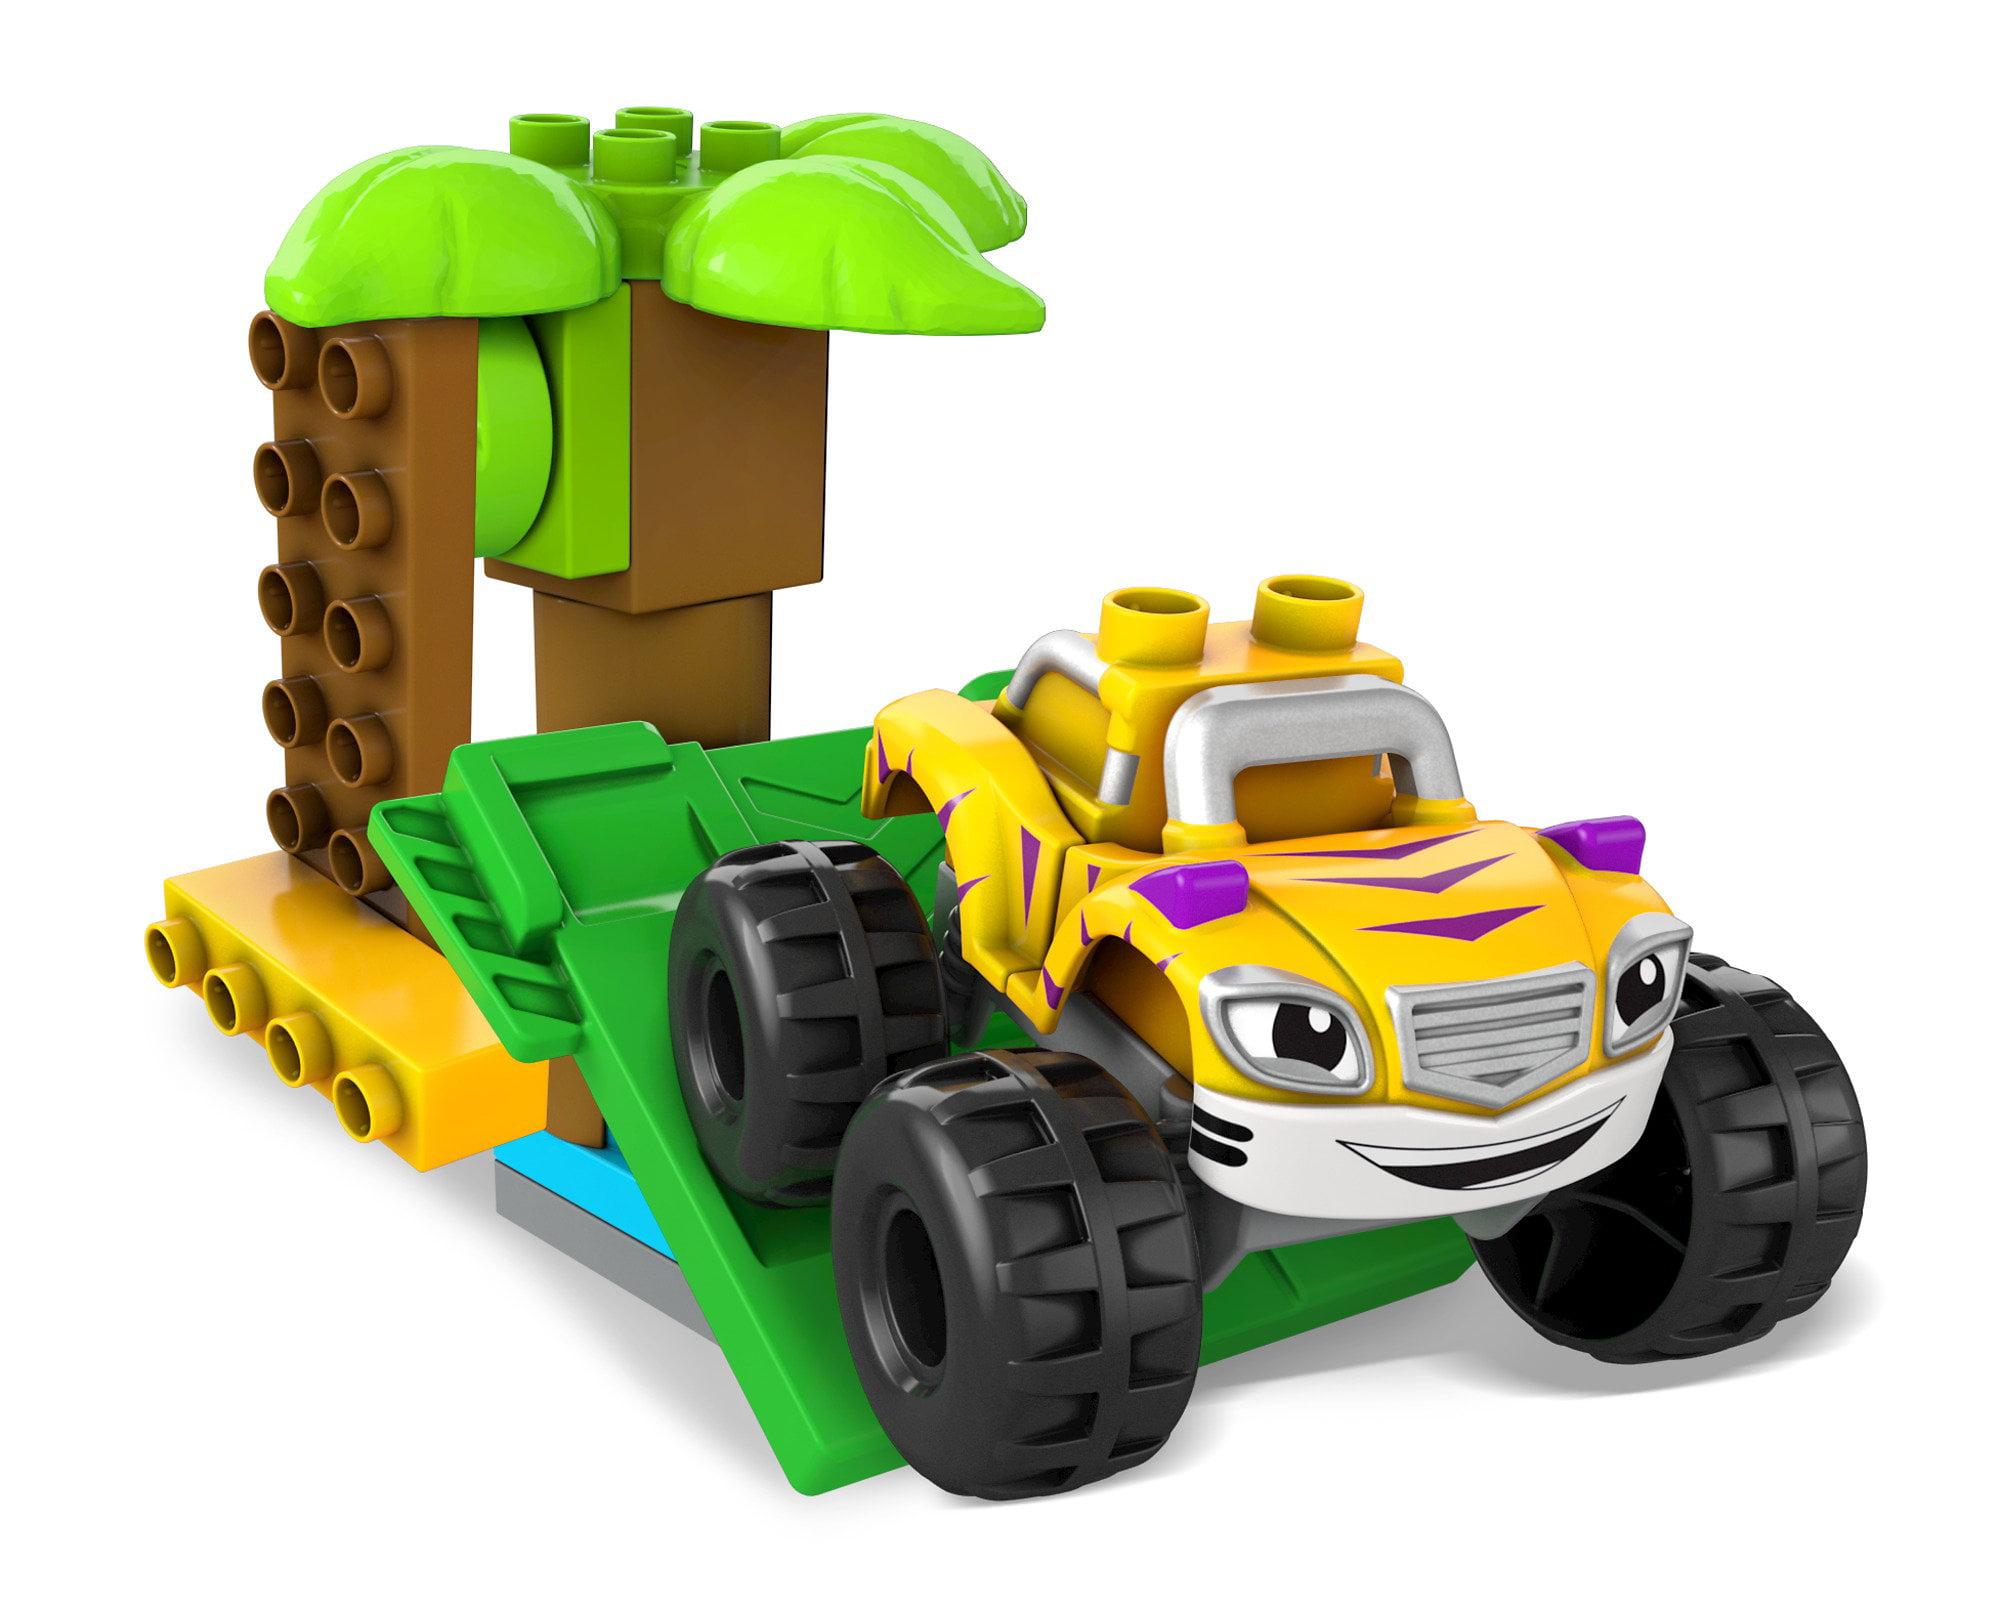 Mega Bloks Nickelodeon Blaze and the Monster Machines Stripes Jungle Stunt Vehicle by Mega Bloks